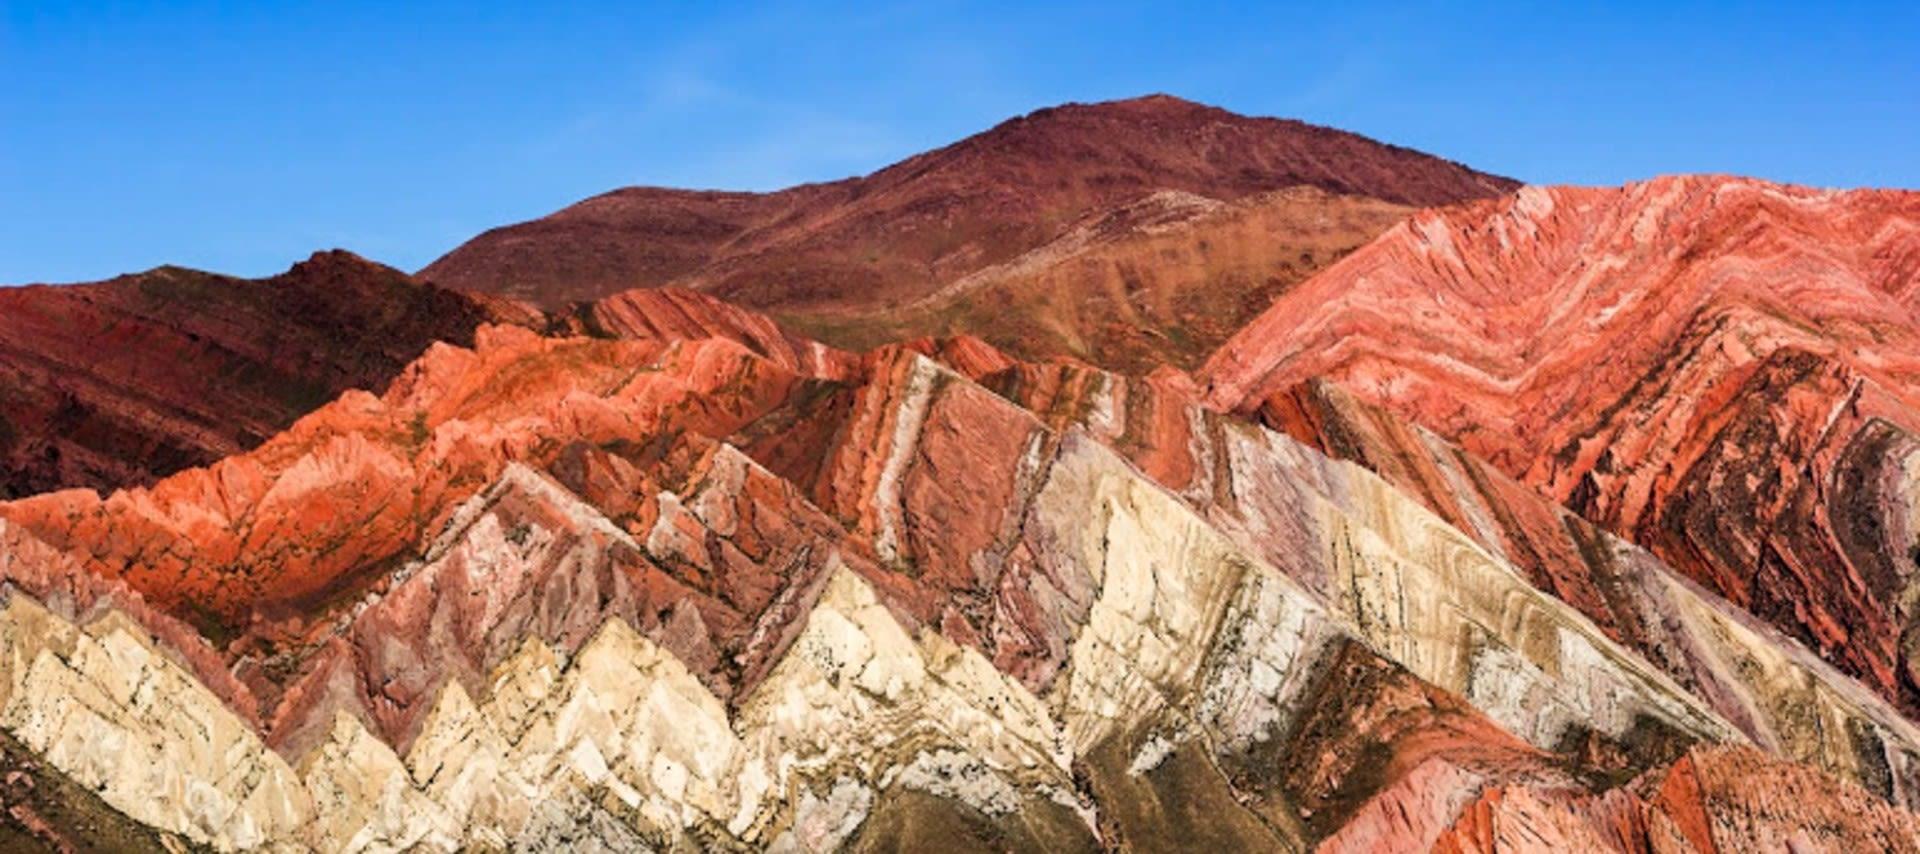 view of the colorful quebrada humahuaca